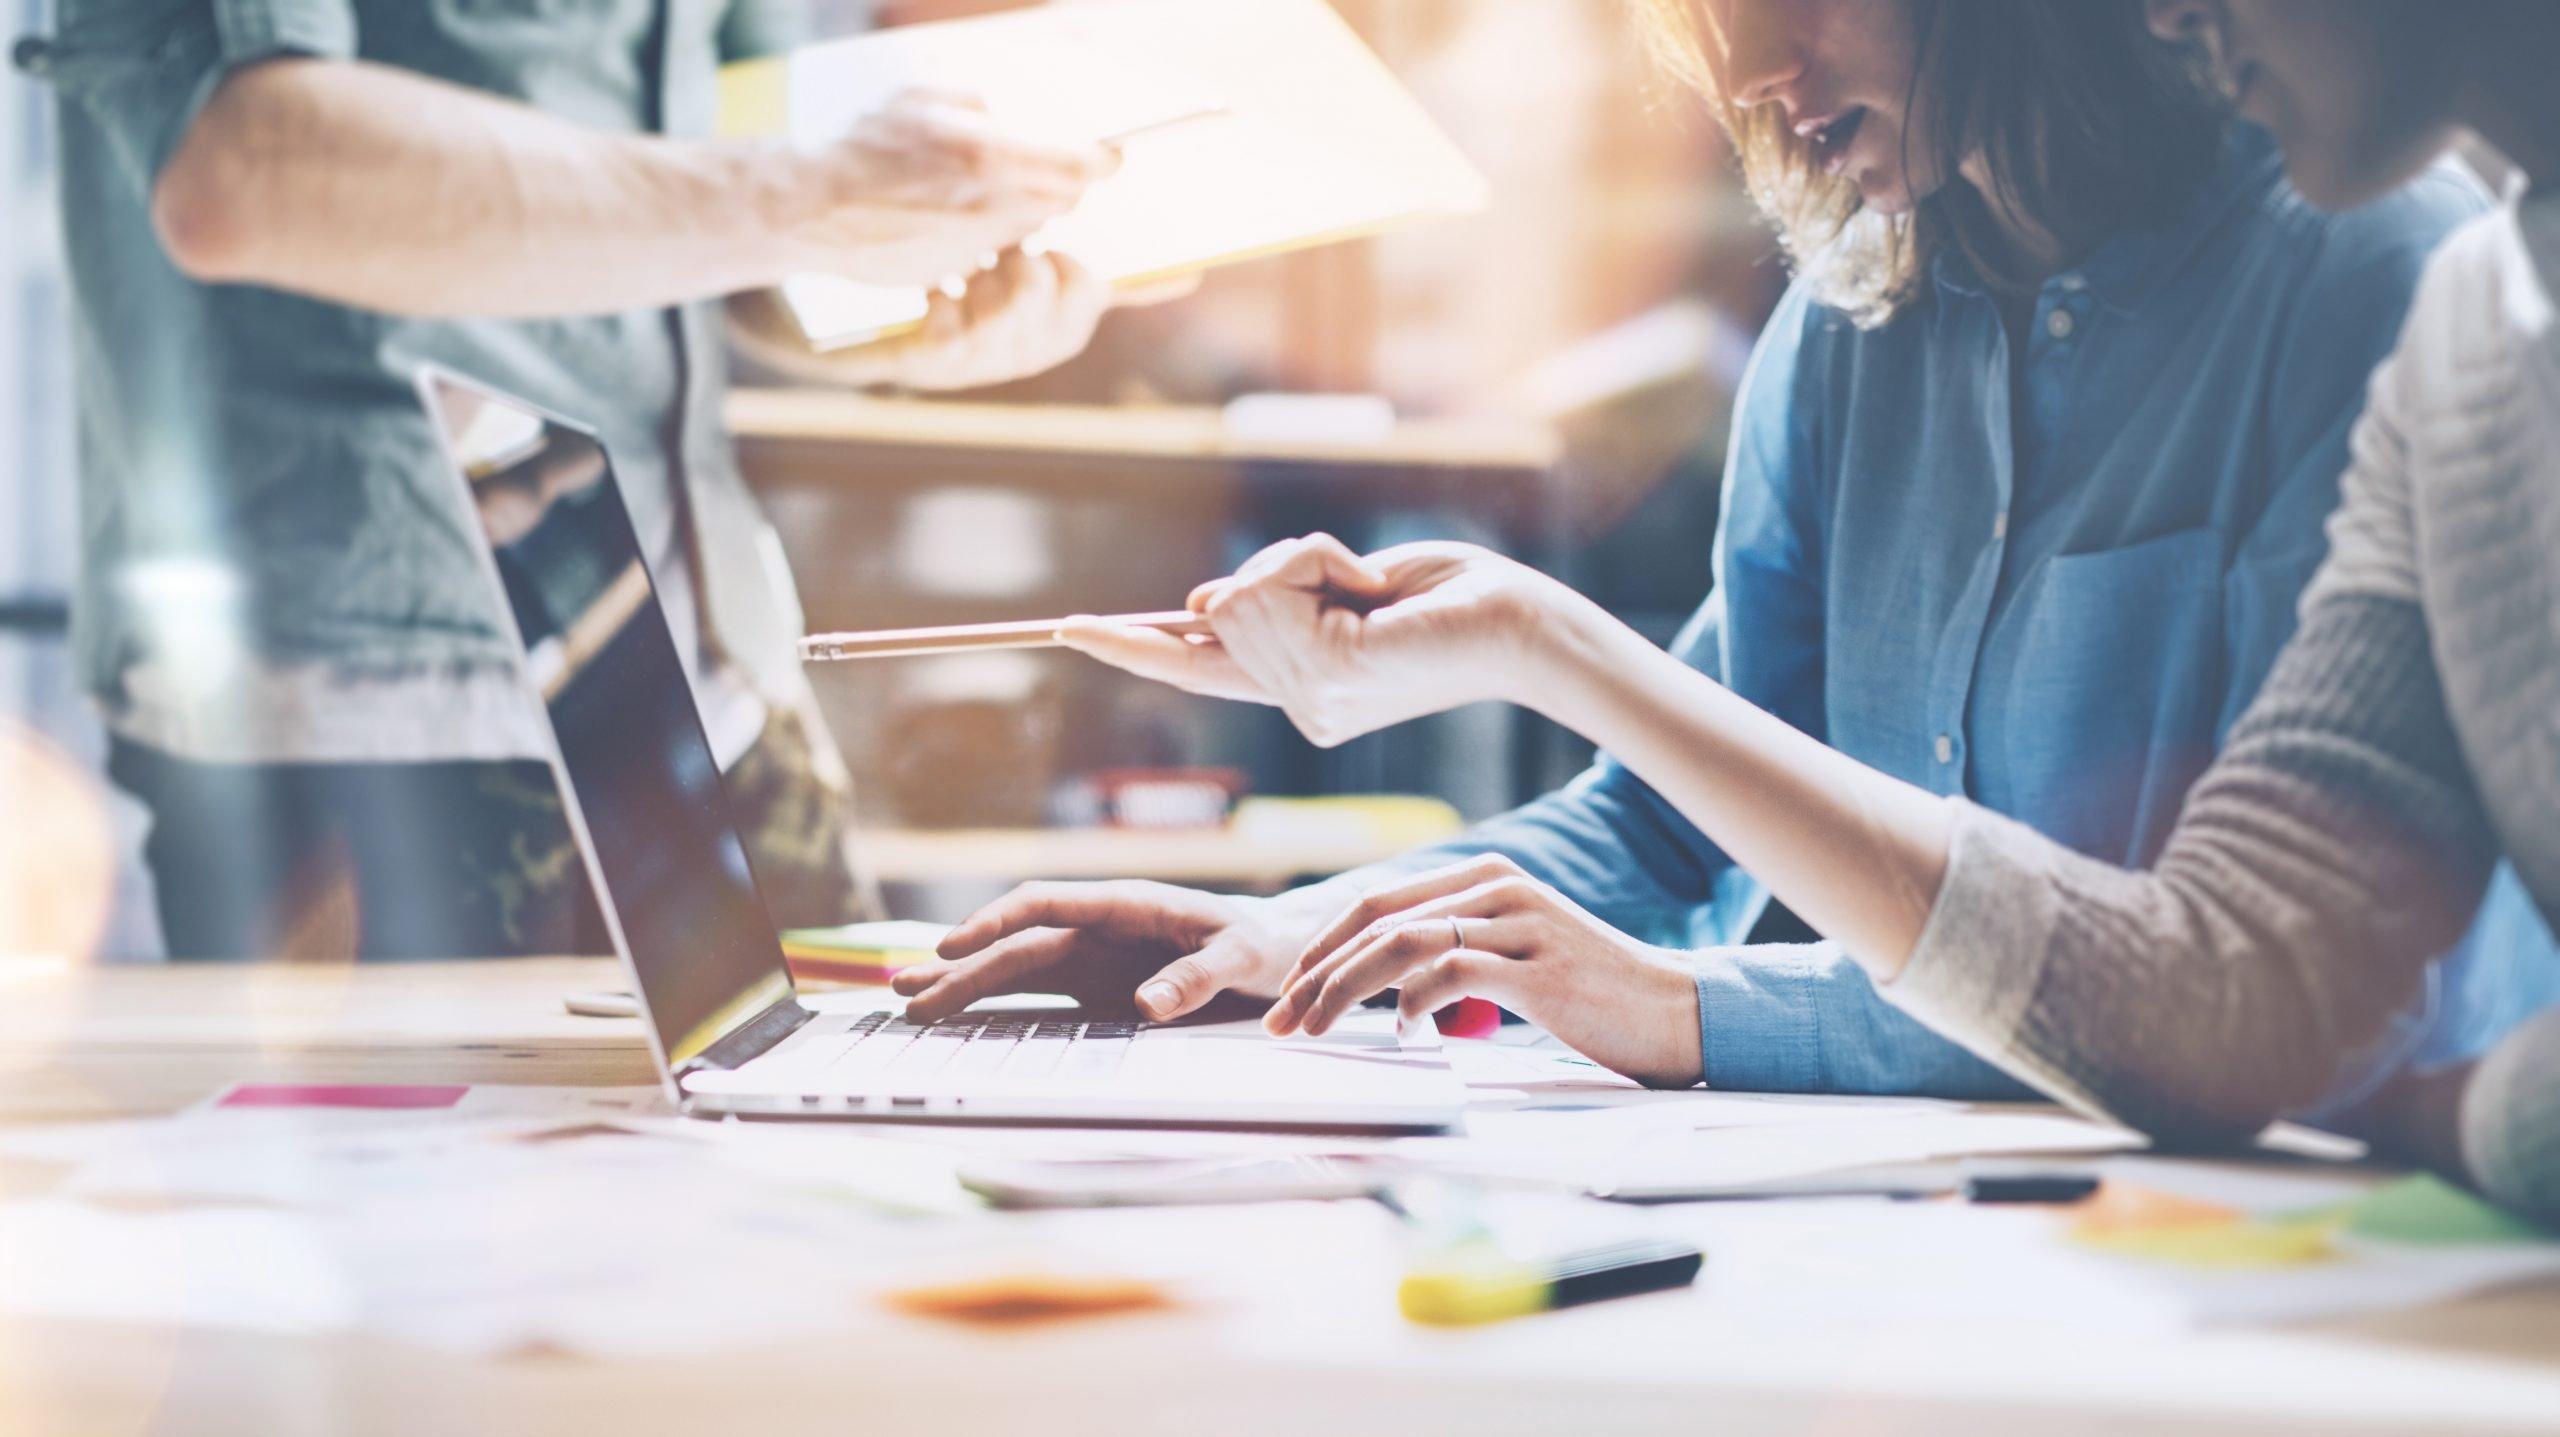 Production Coordinator – Job Description and Salary